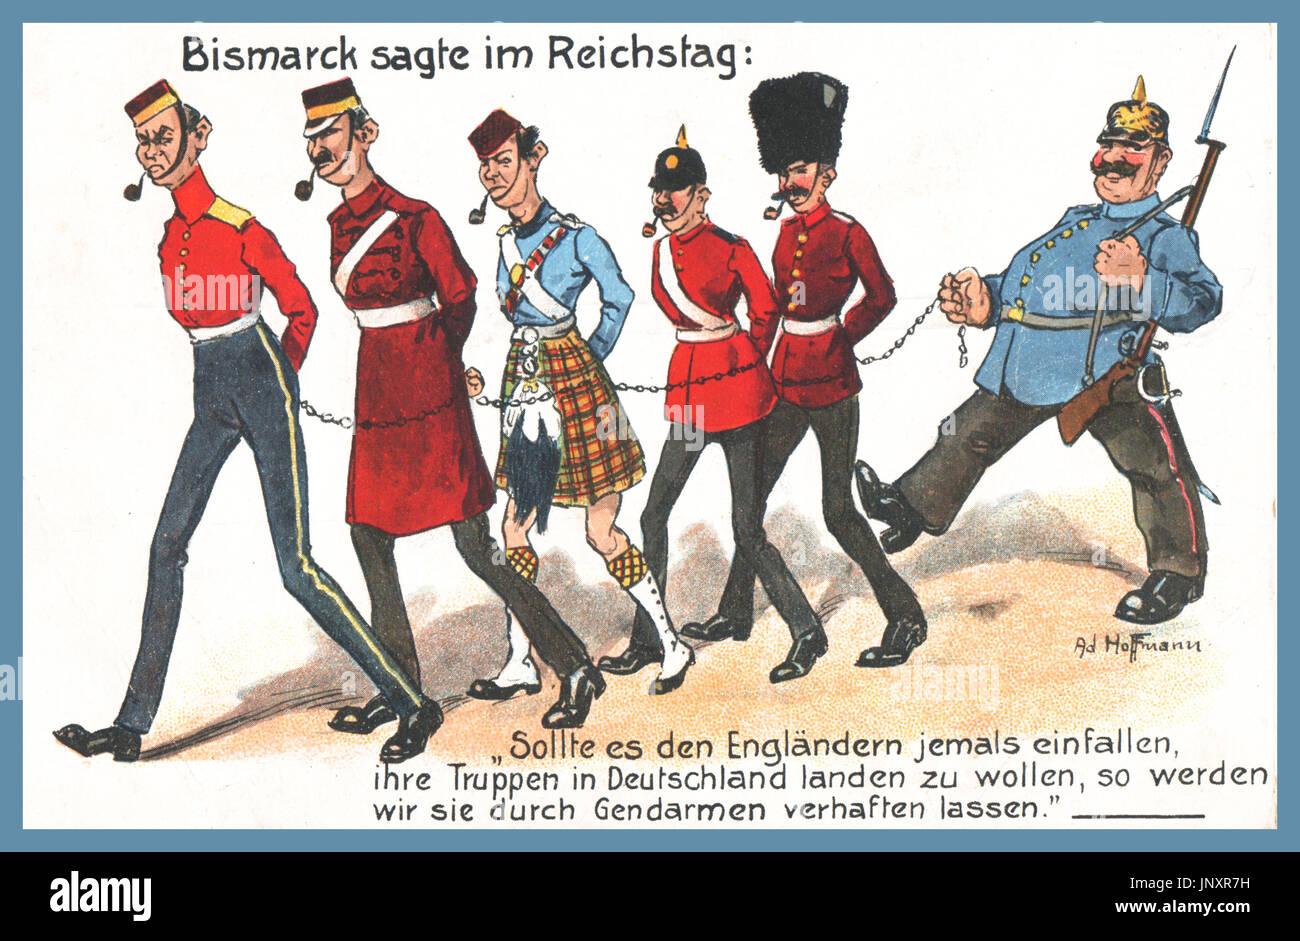 Ww1 German Propaganda Postkarte Bismarck Sagte Im Reichstag Bismarck Sagt Im Reichstag